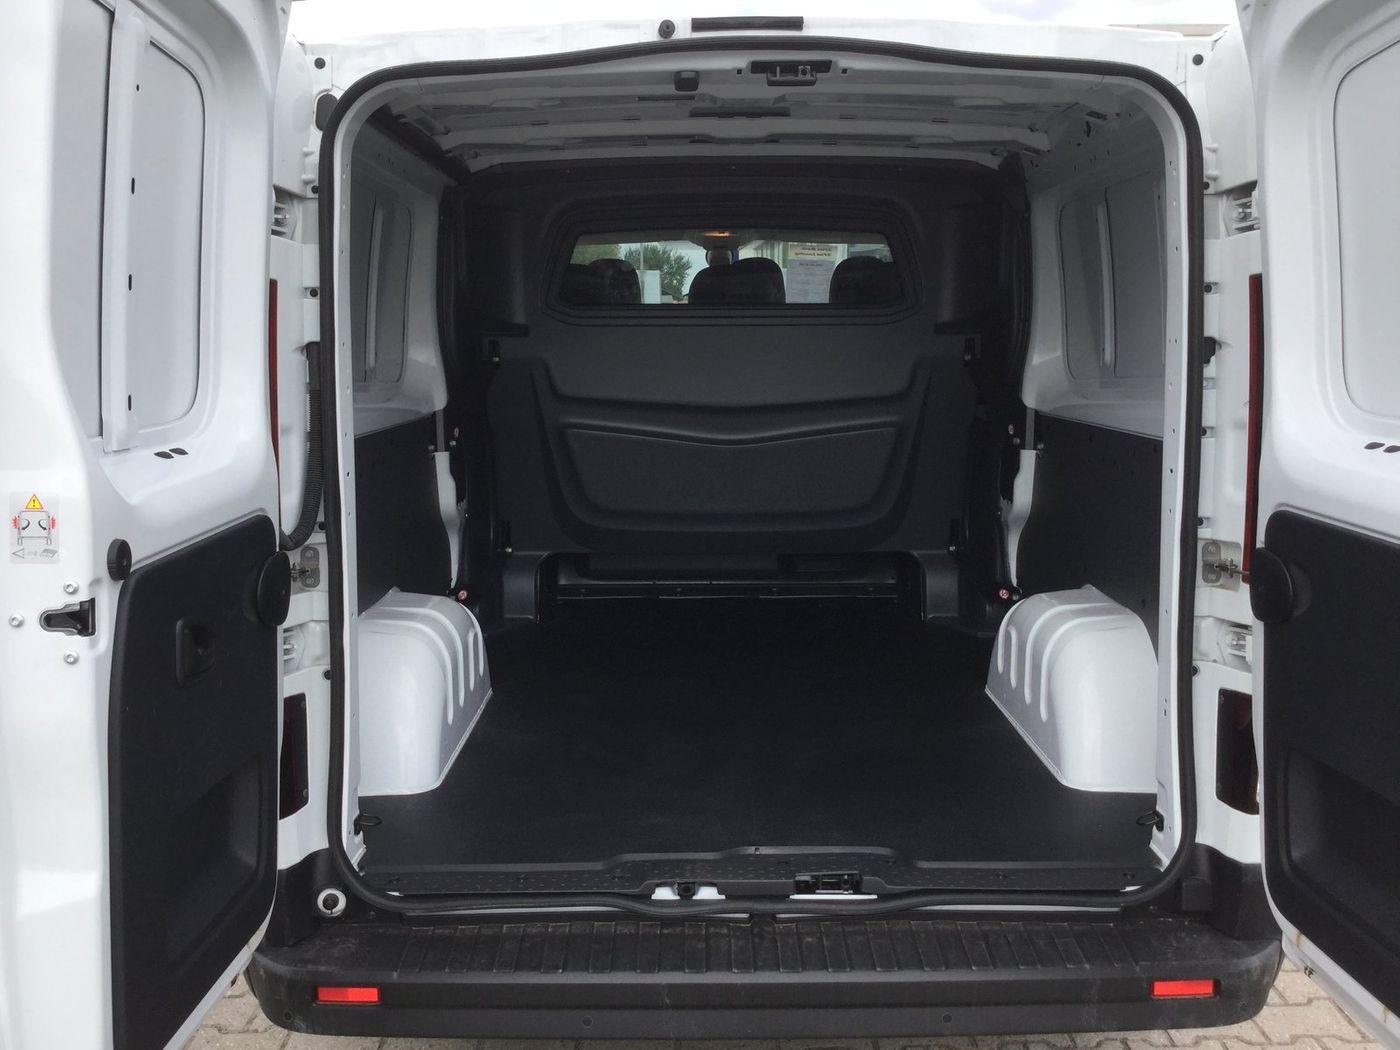 fiat talento multicab sx 1 6 ecojet neuwagen. Black Bedroom Furniture Sets. Home Design Ideas